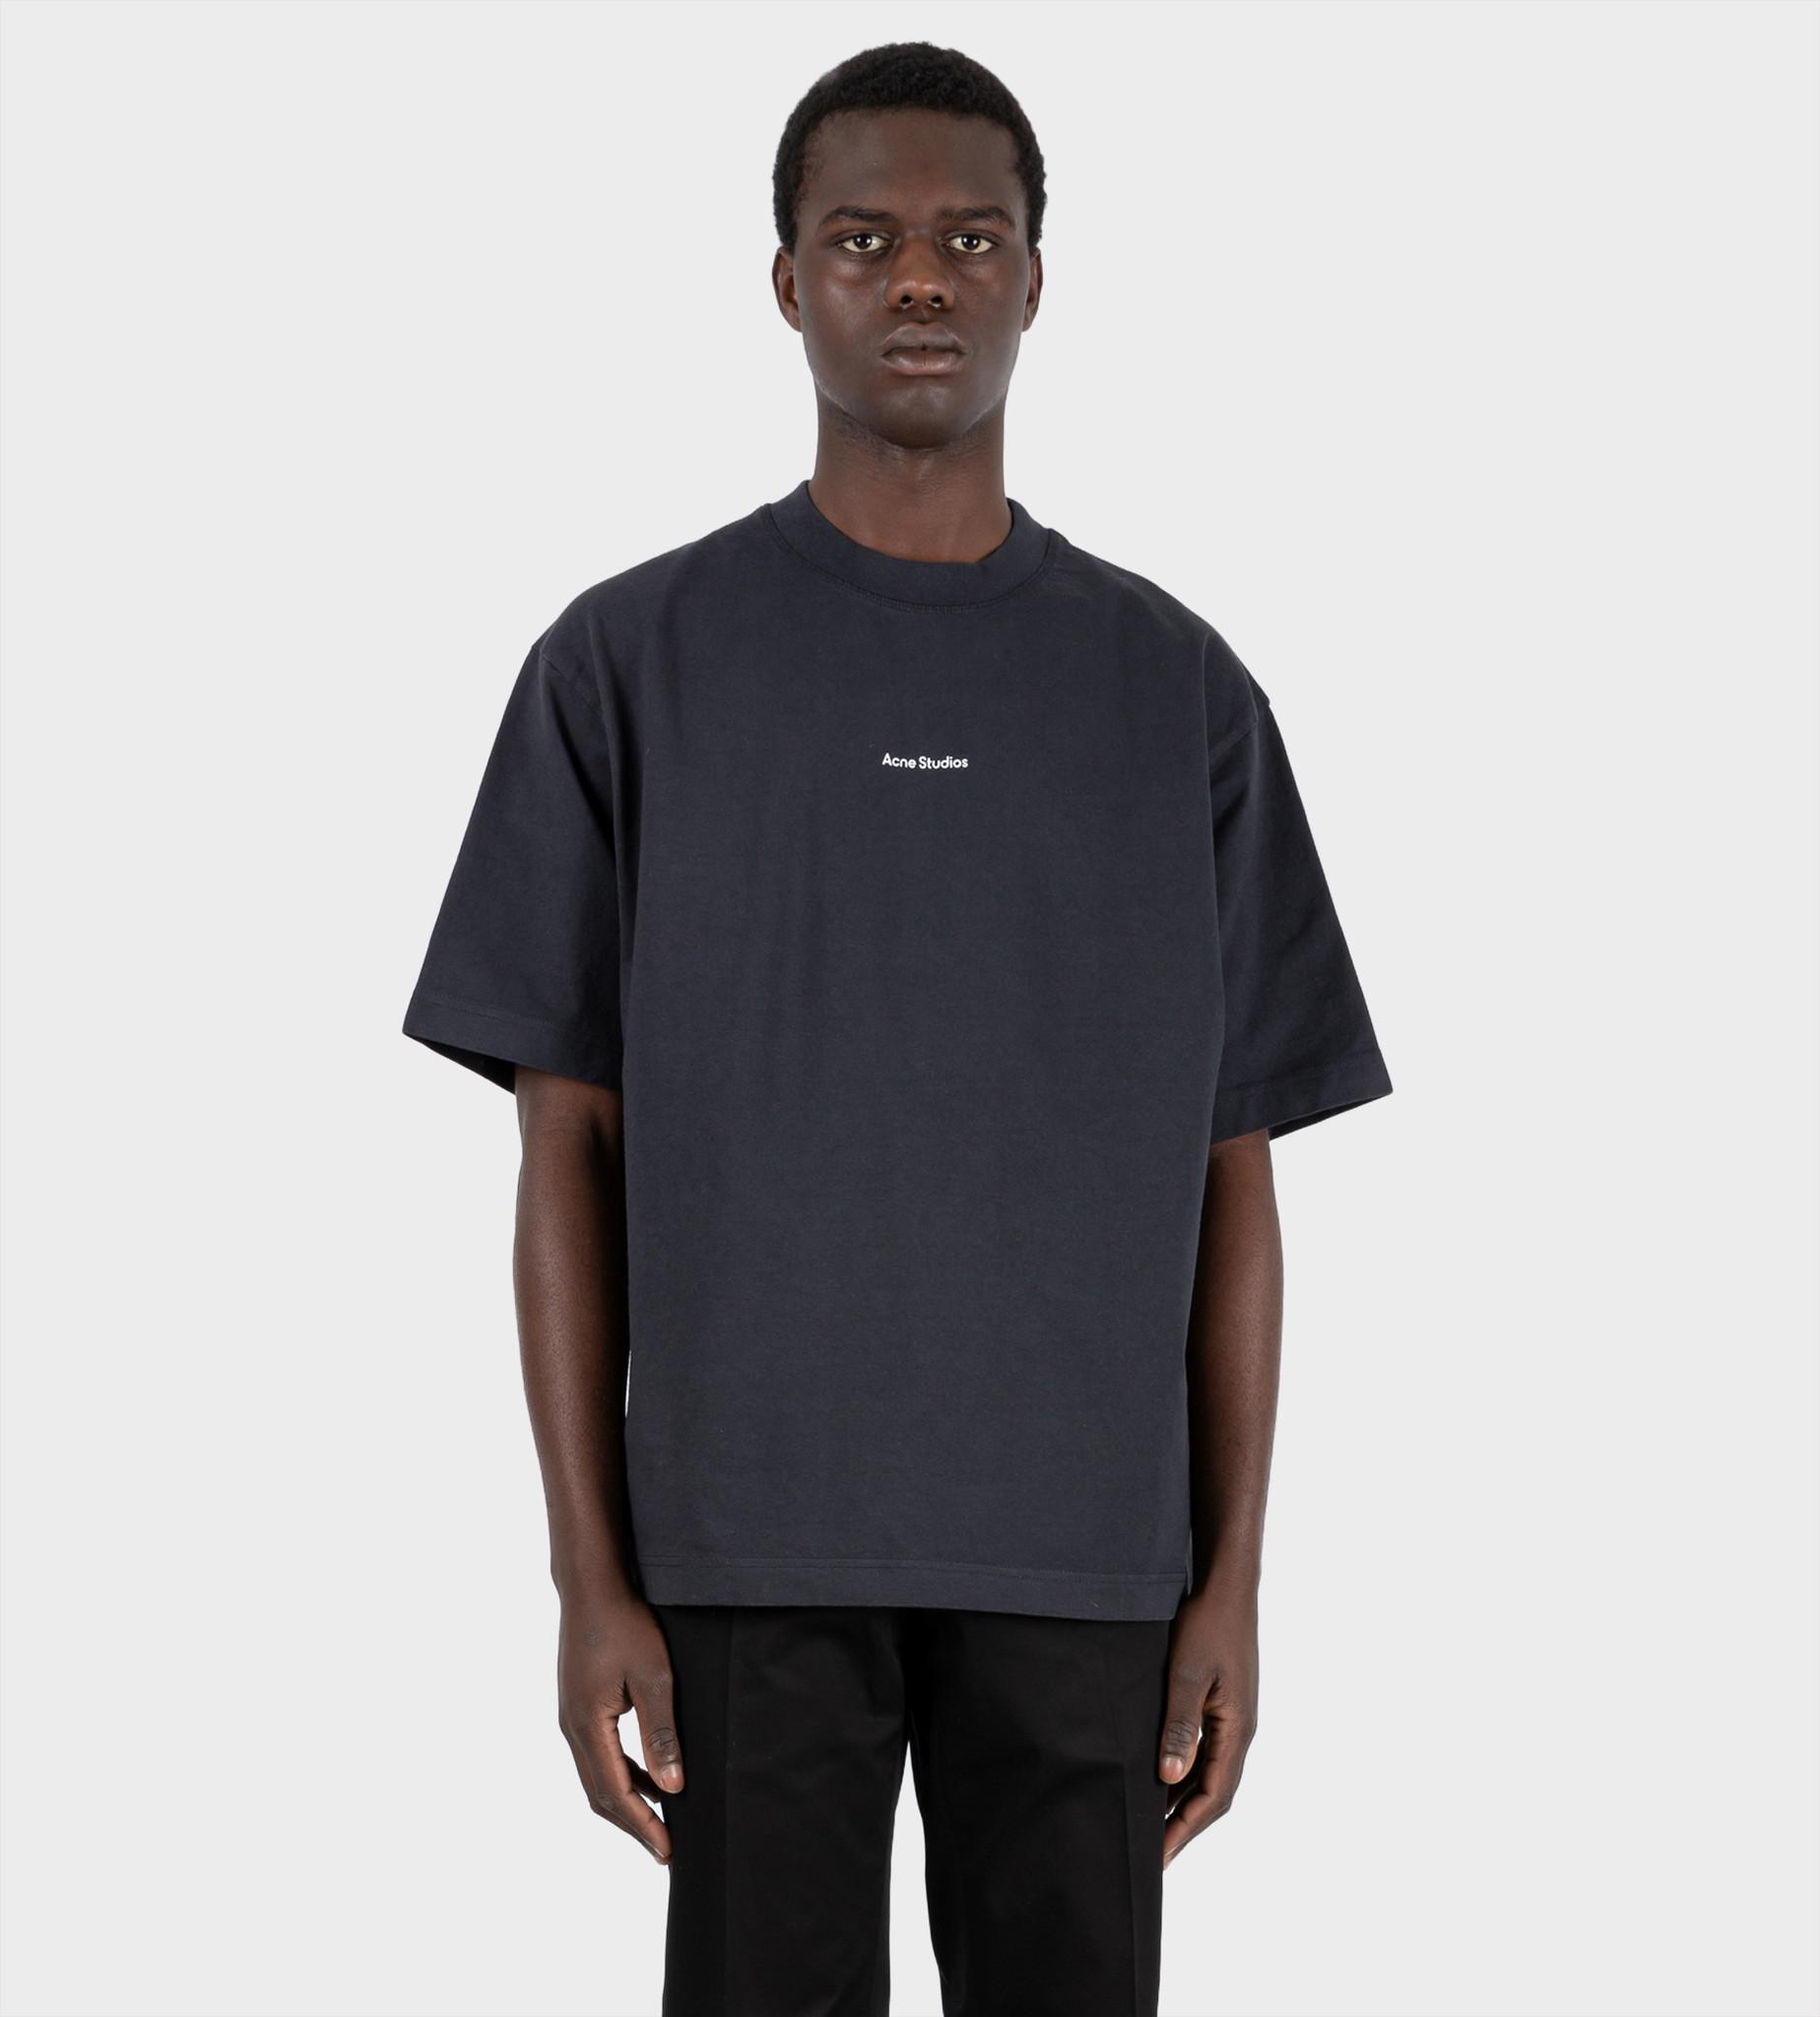 ACNE STUDIOS Logo Printed T-shirt Black